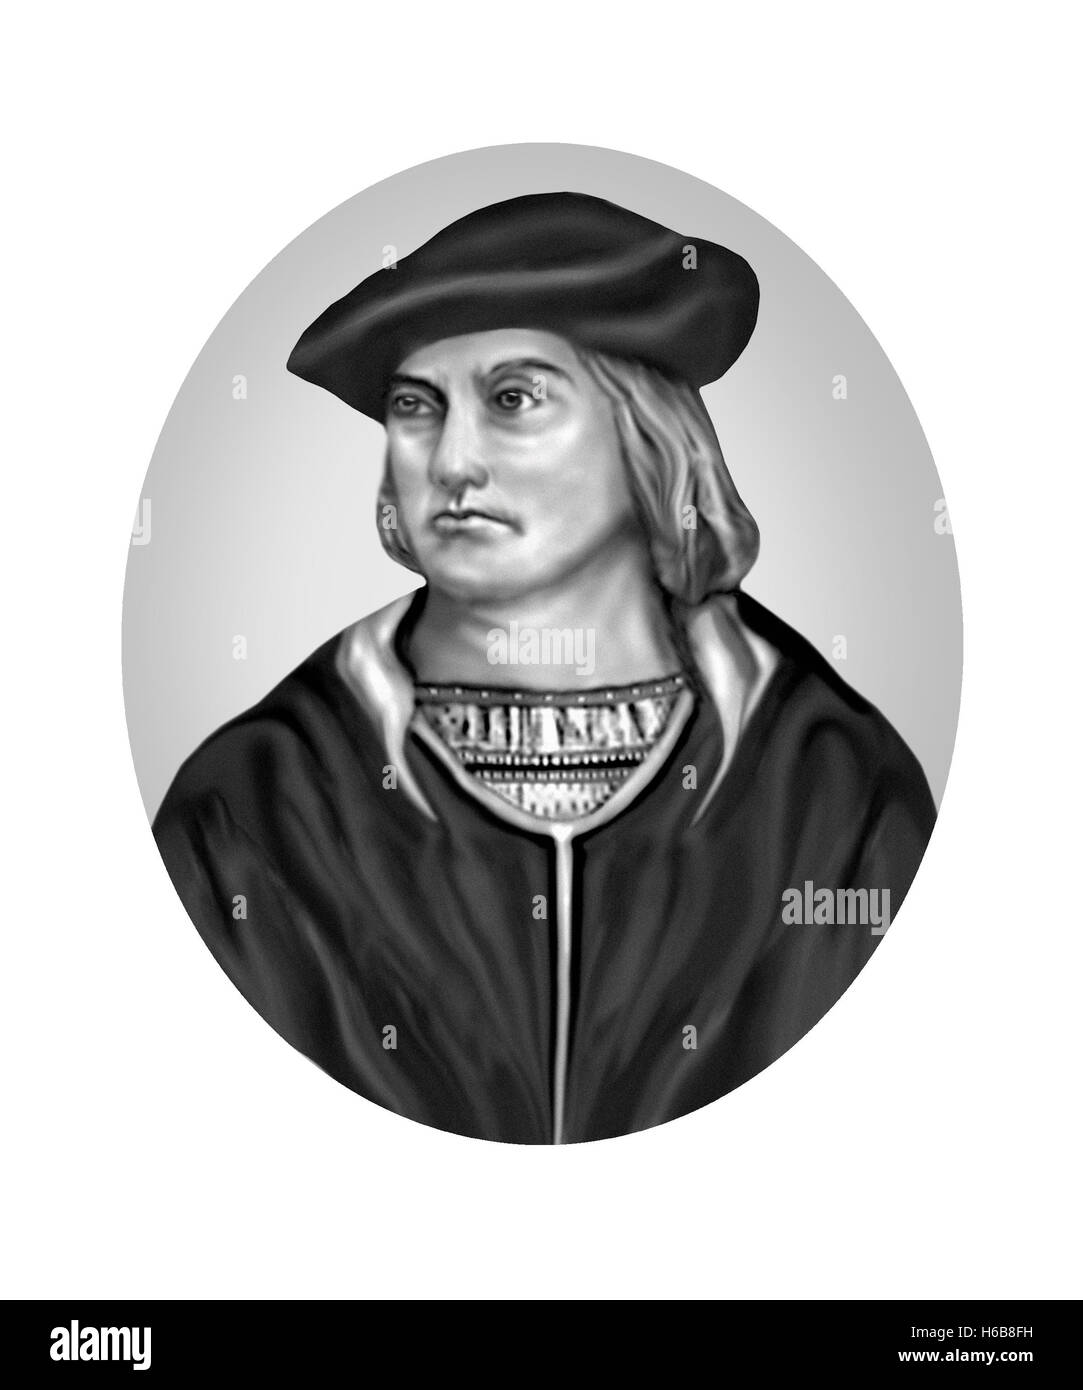 Bartolomeu Dias, c1450-1500, Navigator, Explorer - Stock Image